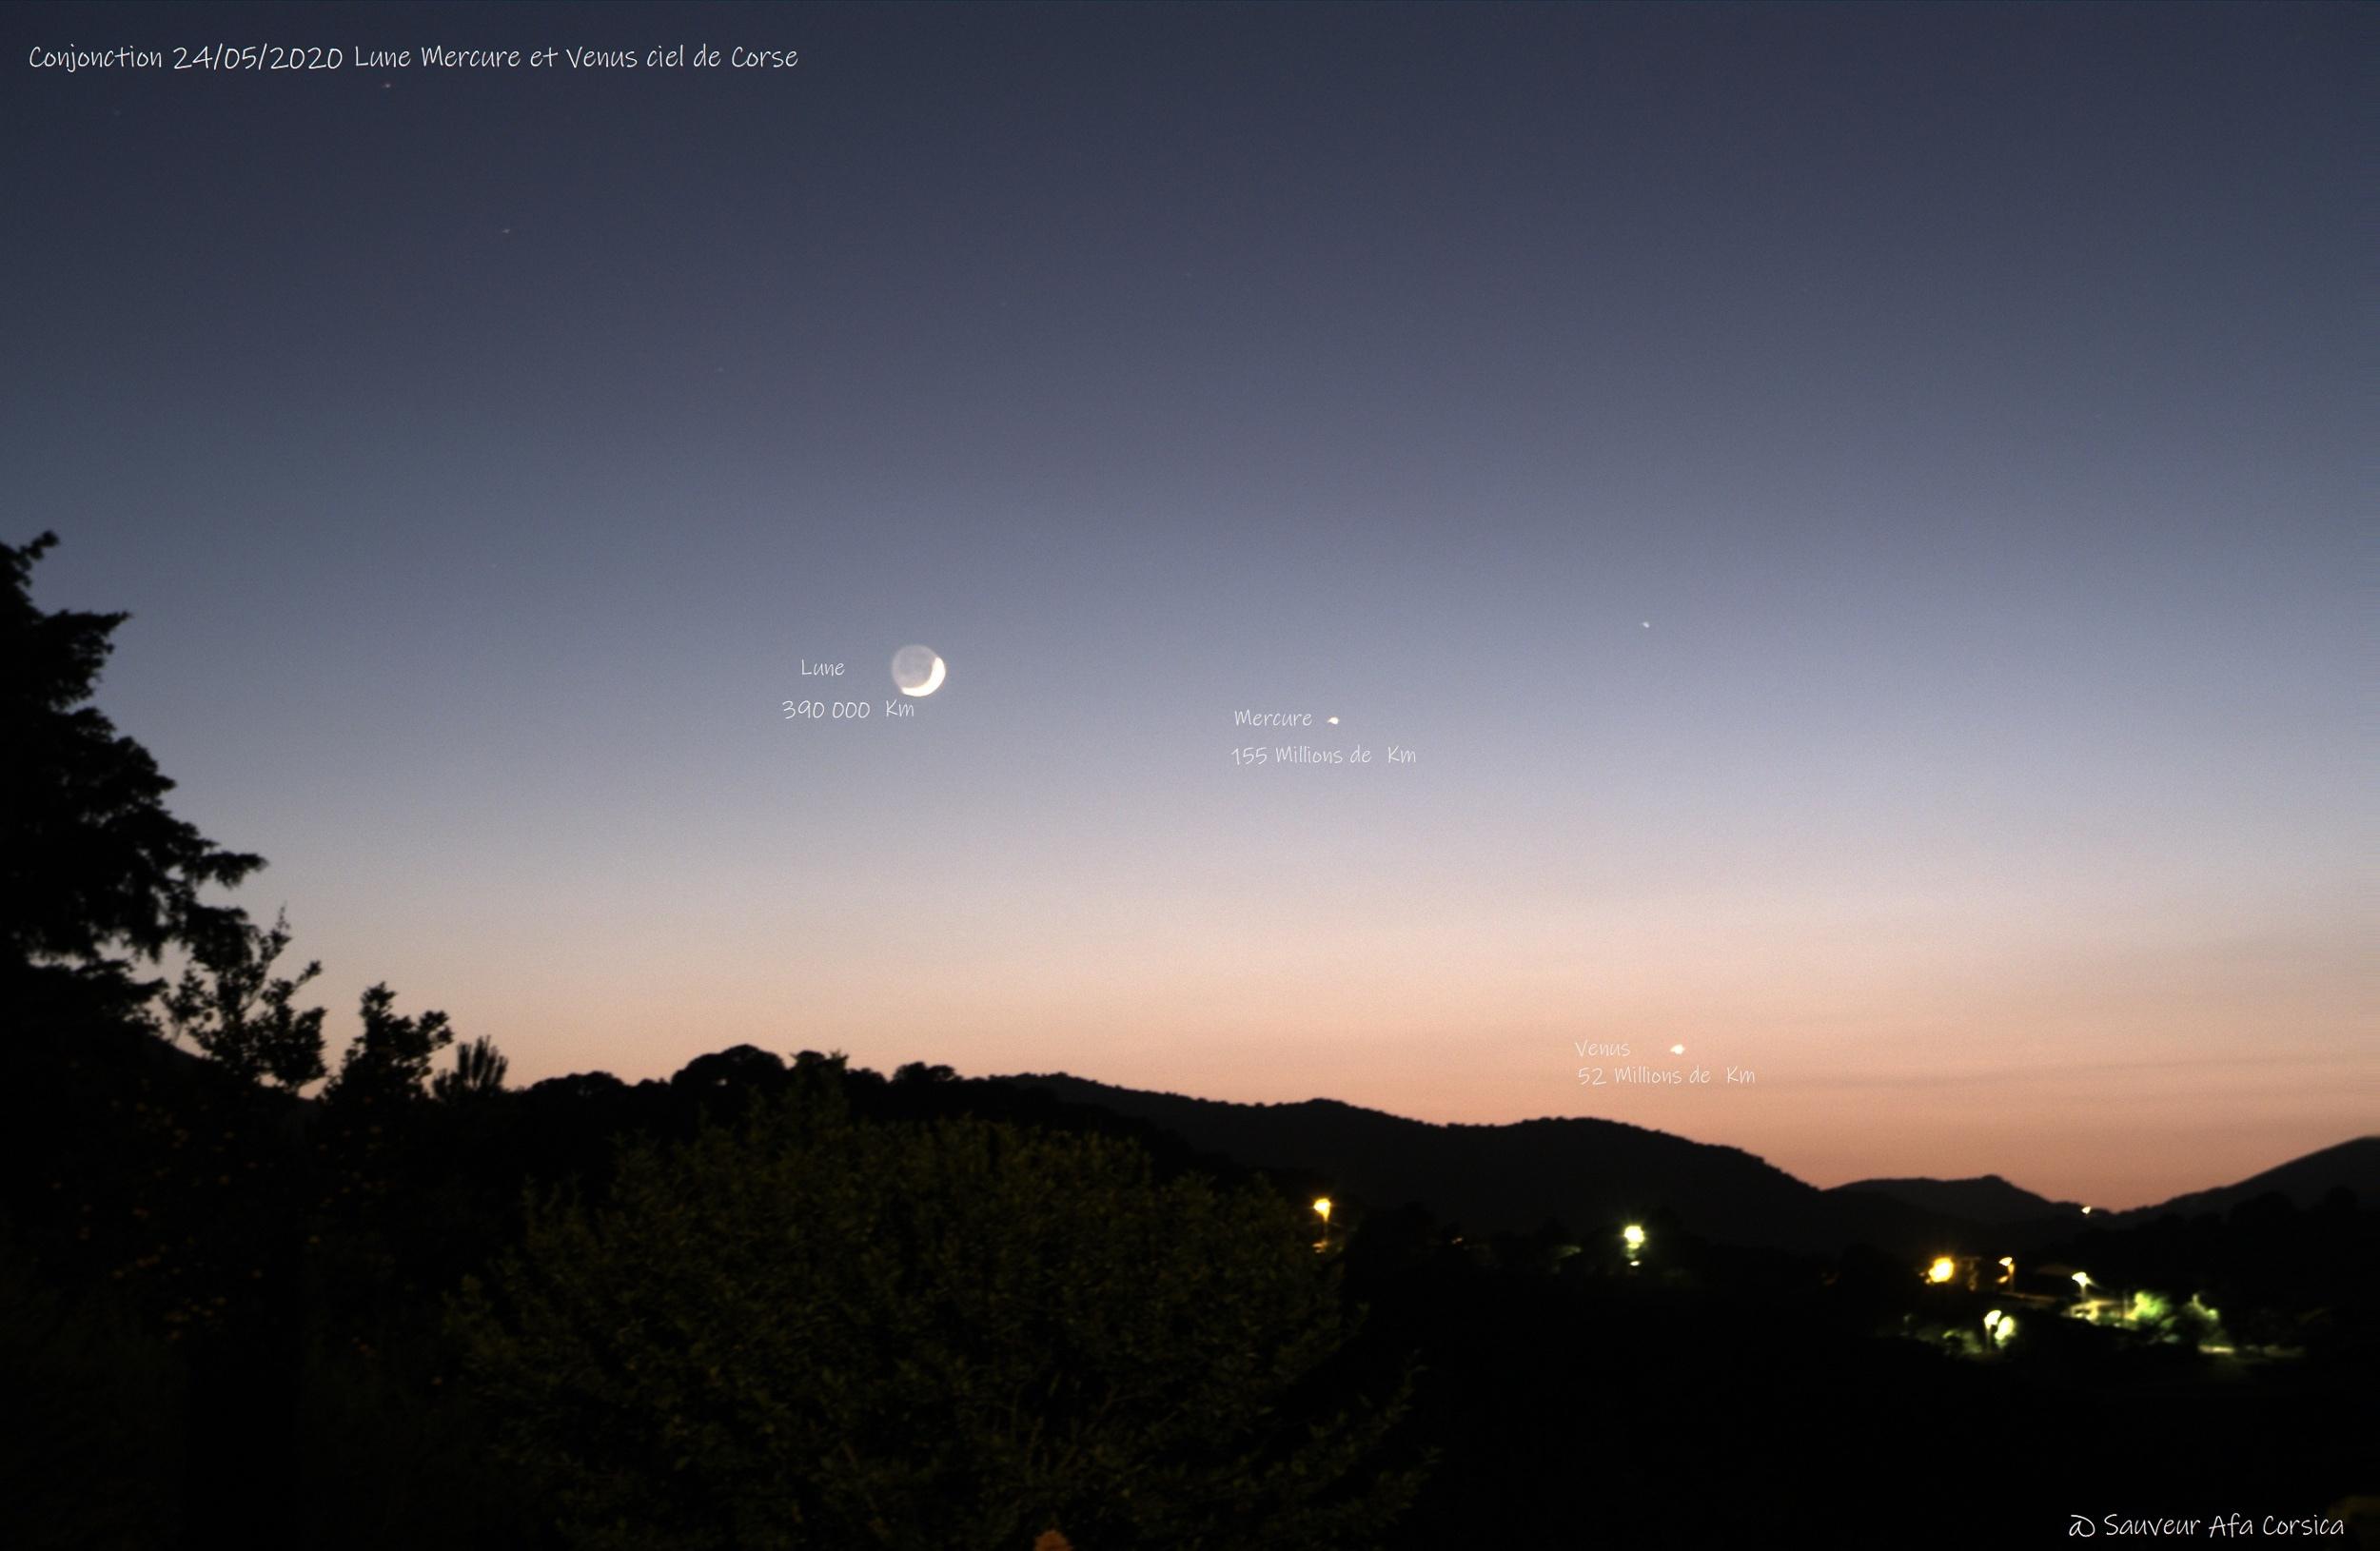 Lune cendré Venus Mercure 240520 km.jpg